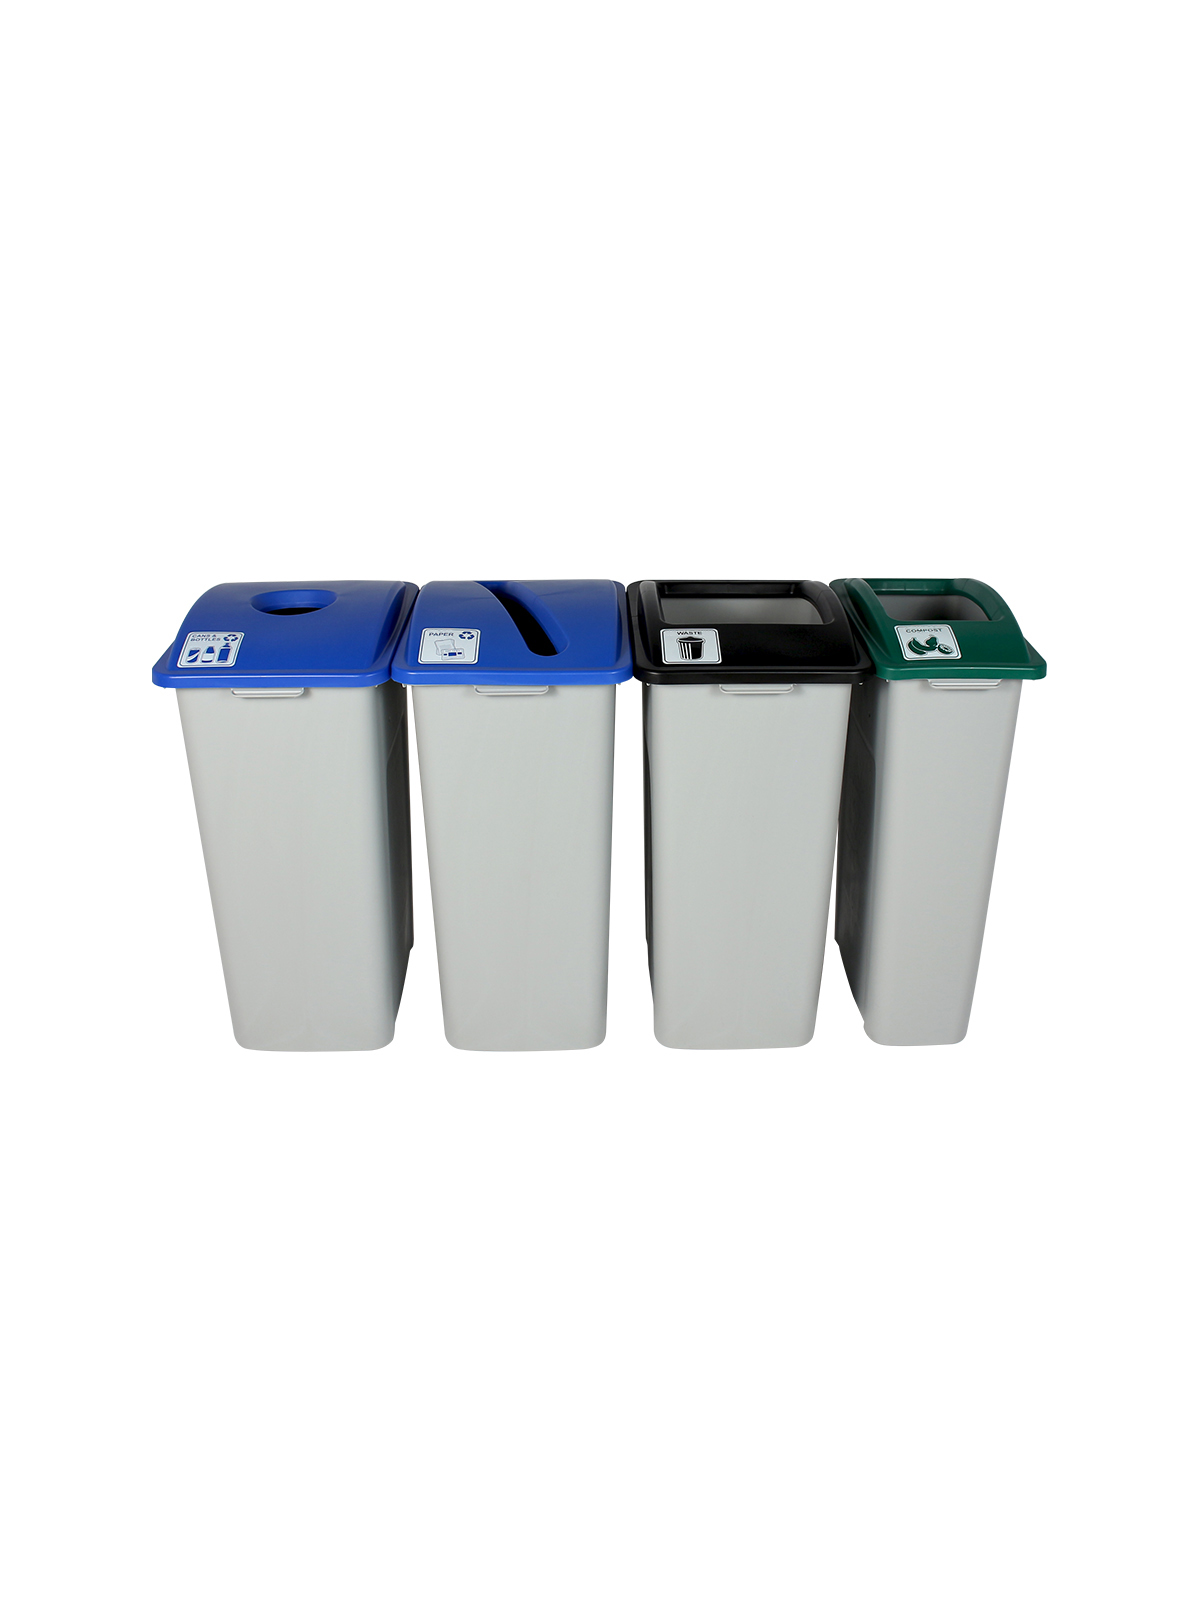 WASTE WATCHER XL - Quad - Cans & Bottles-Paper-Compost-Waste - Circle-Slot-Full - Grey-Blue-Blue-Green-Black